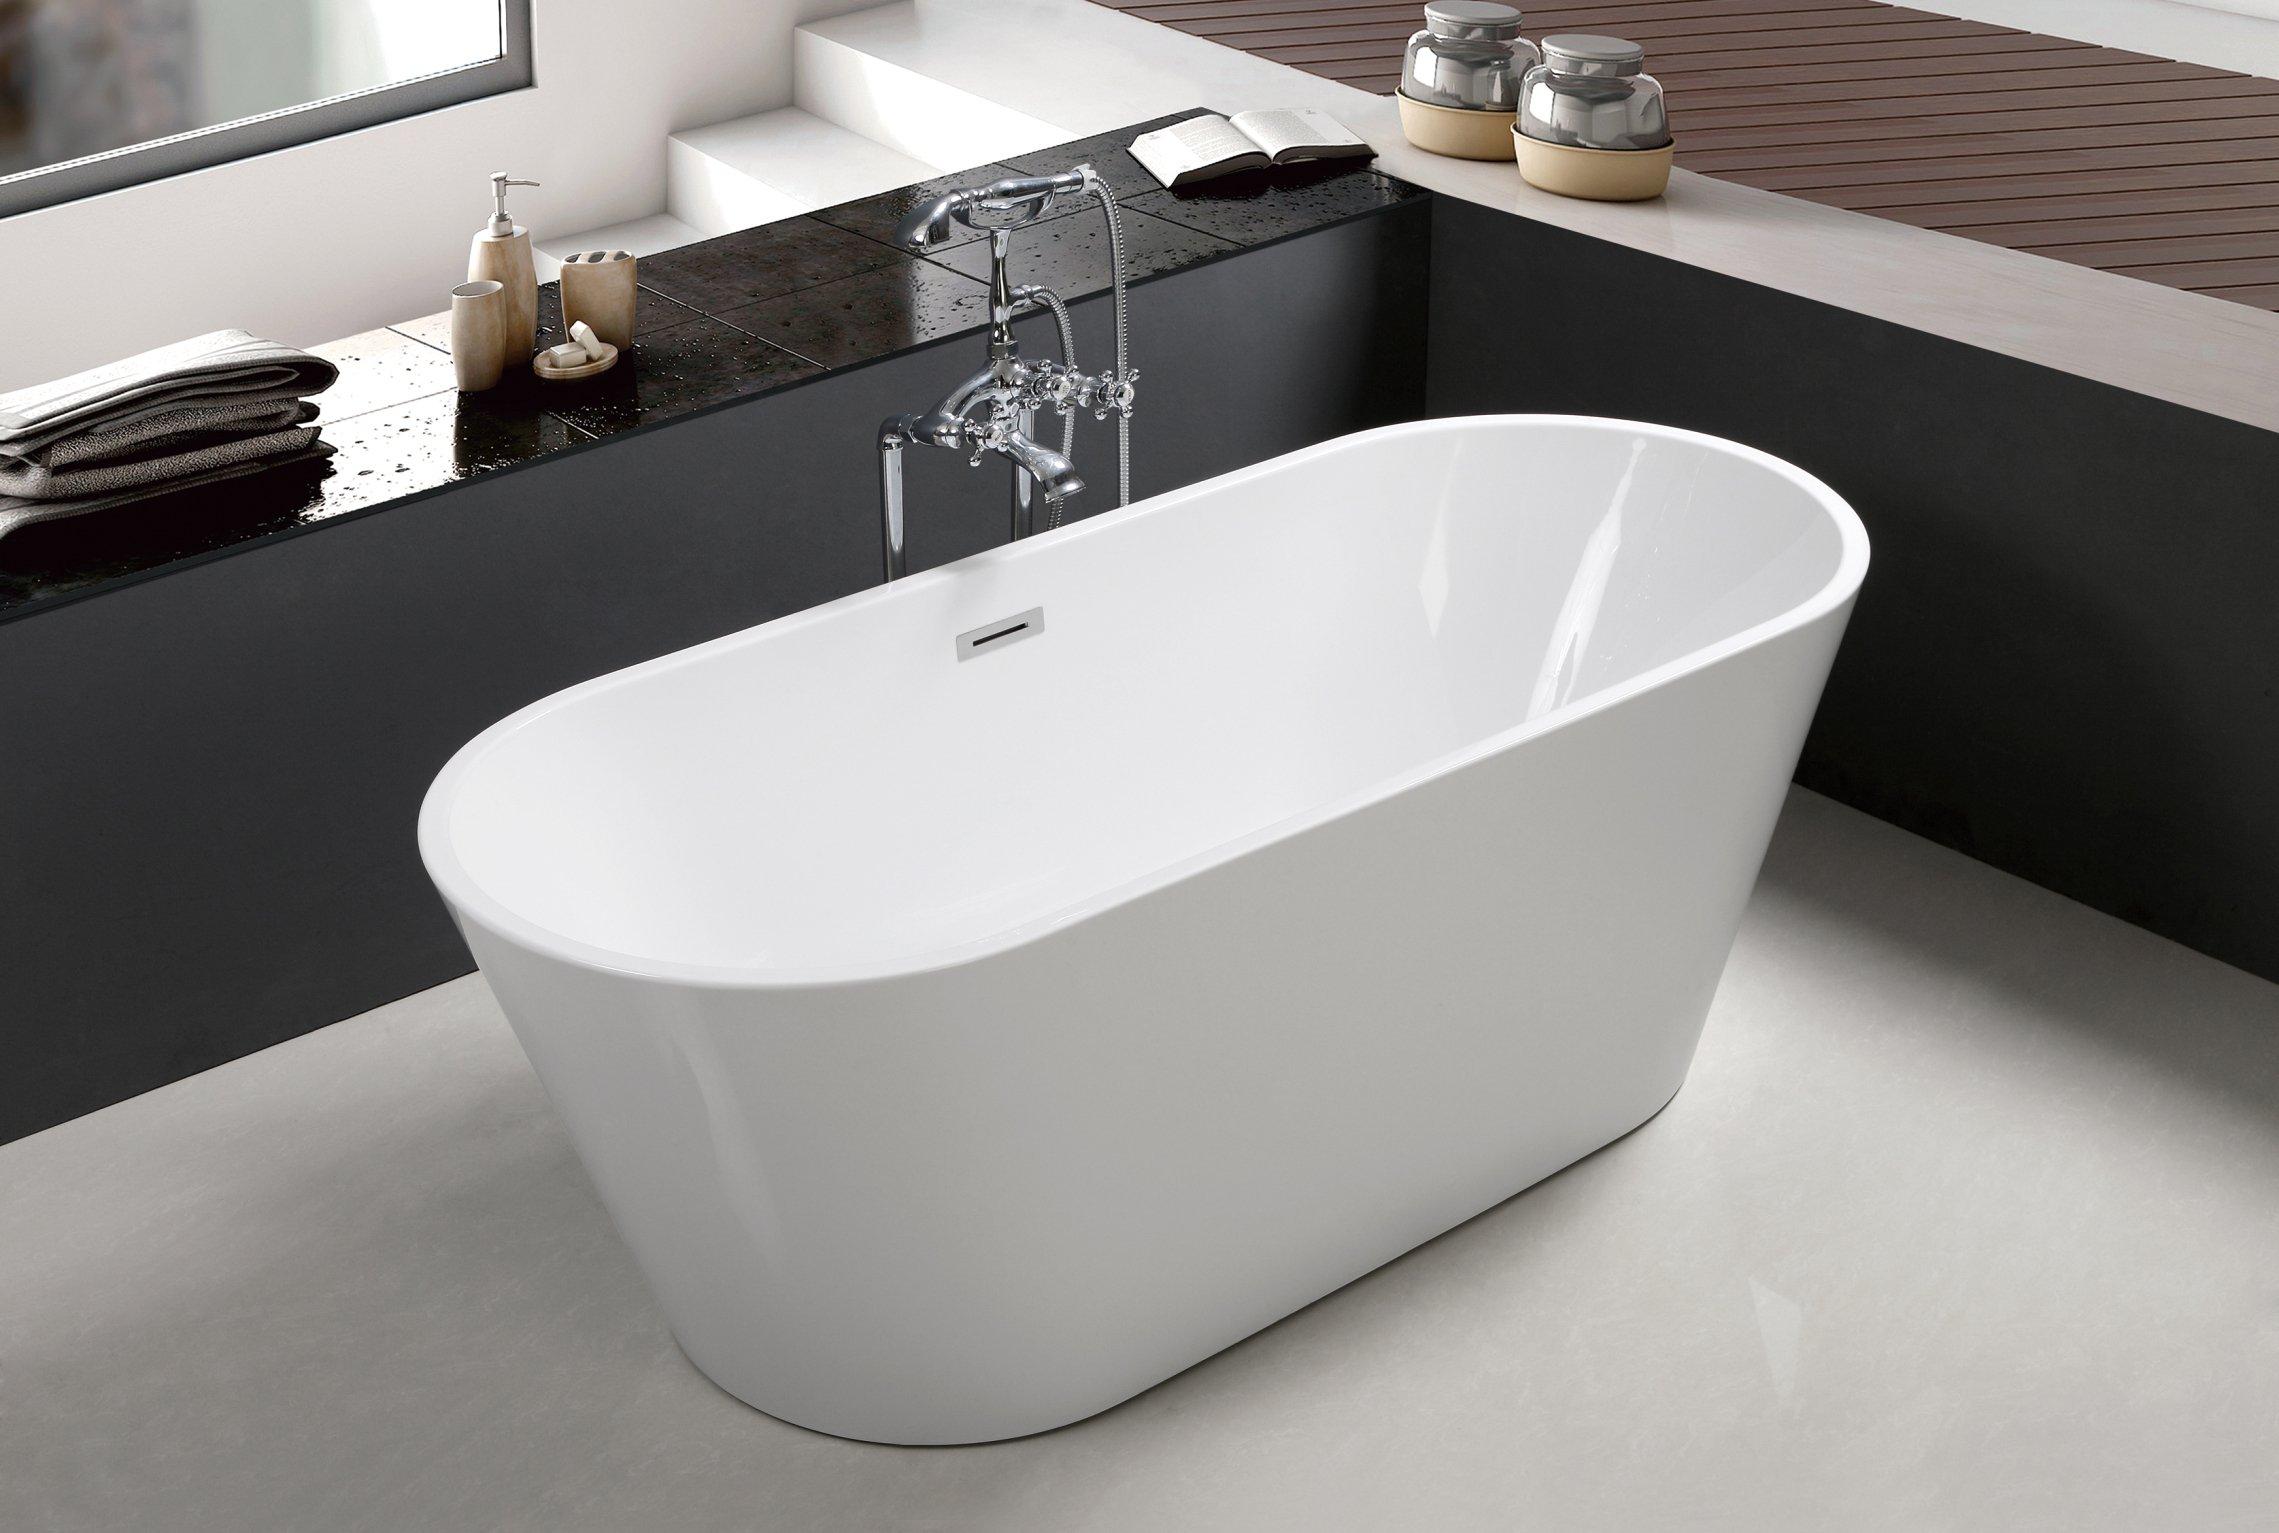 67'' Freestanding Luxury Bathtub White Acrylic